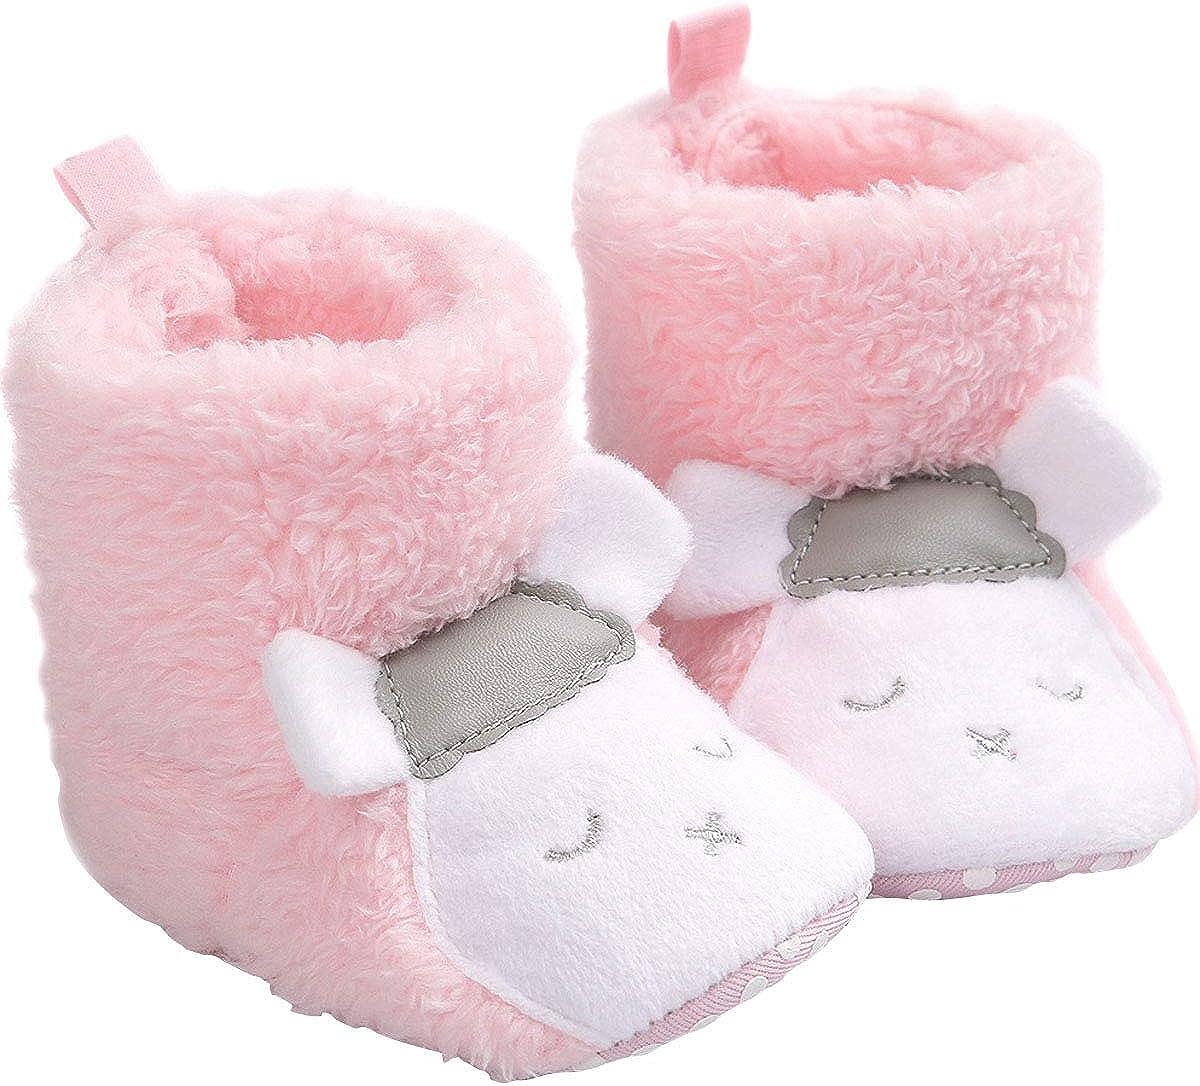 vanberfia Unisex Baby Soft Great interest Sole Spasm price Fleece Knit Snow Boots Fur Infan